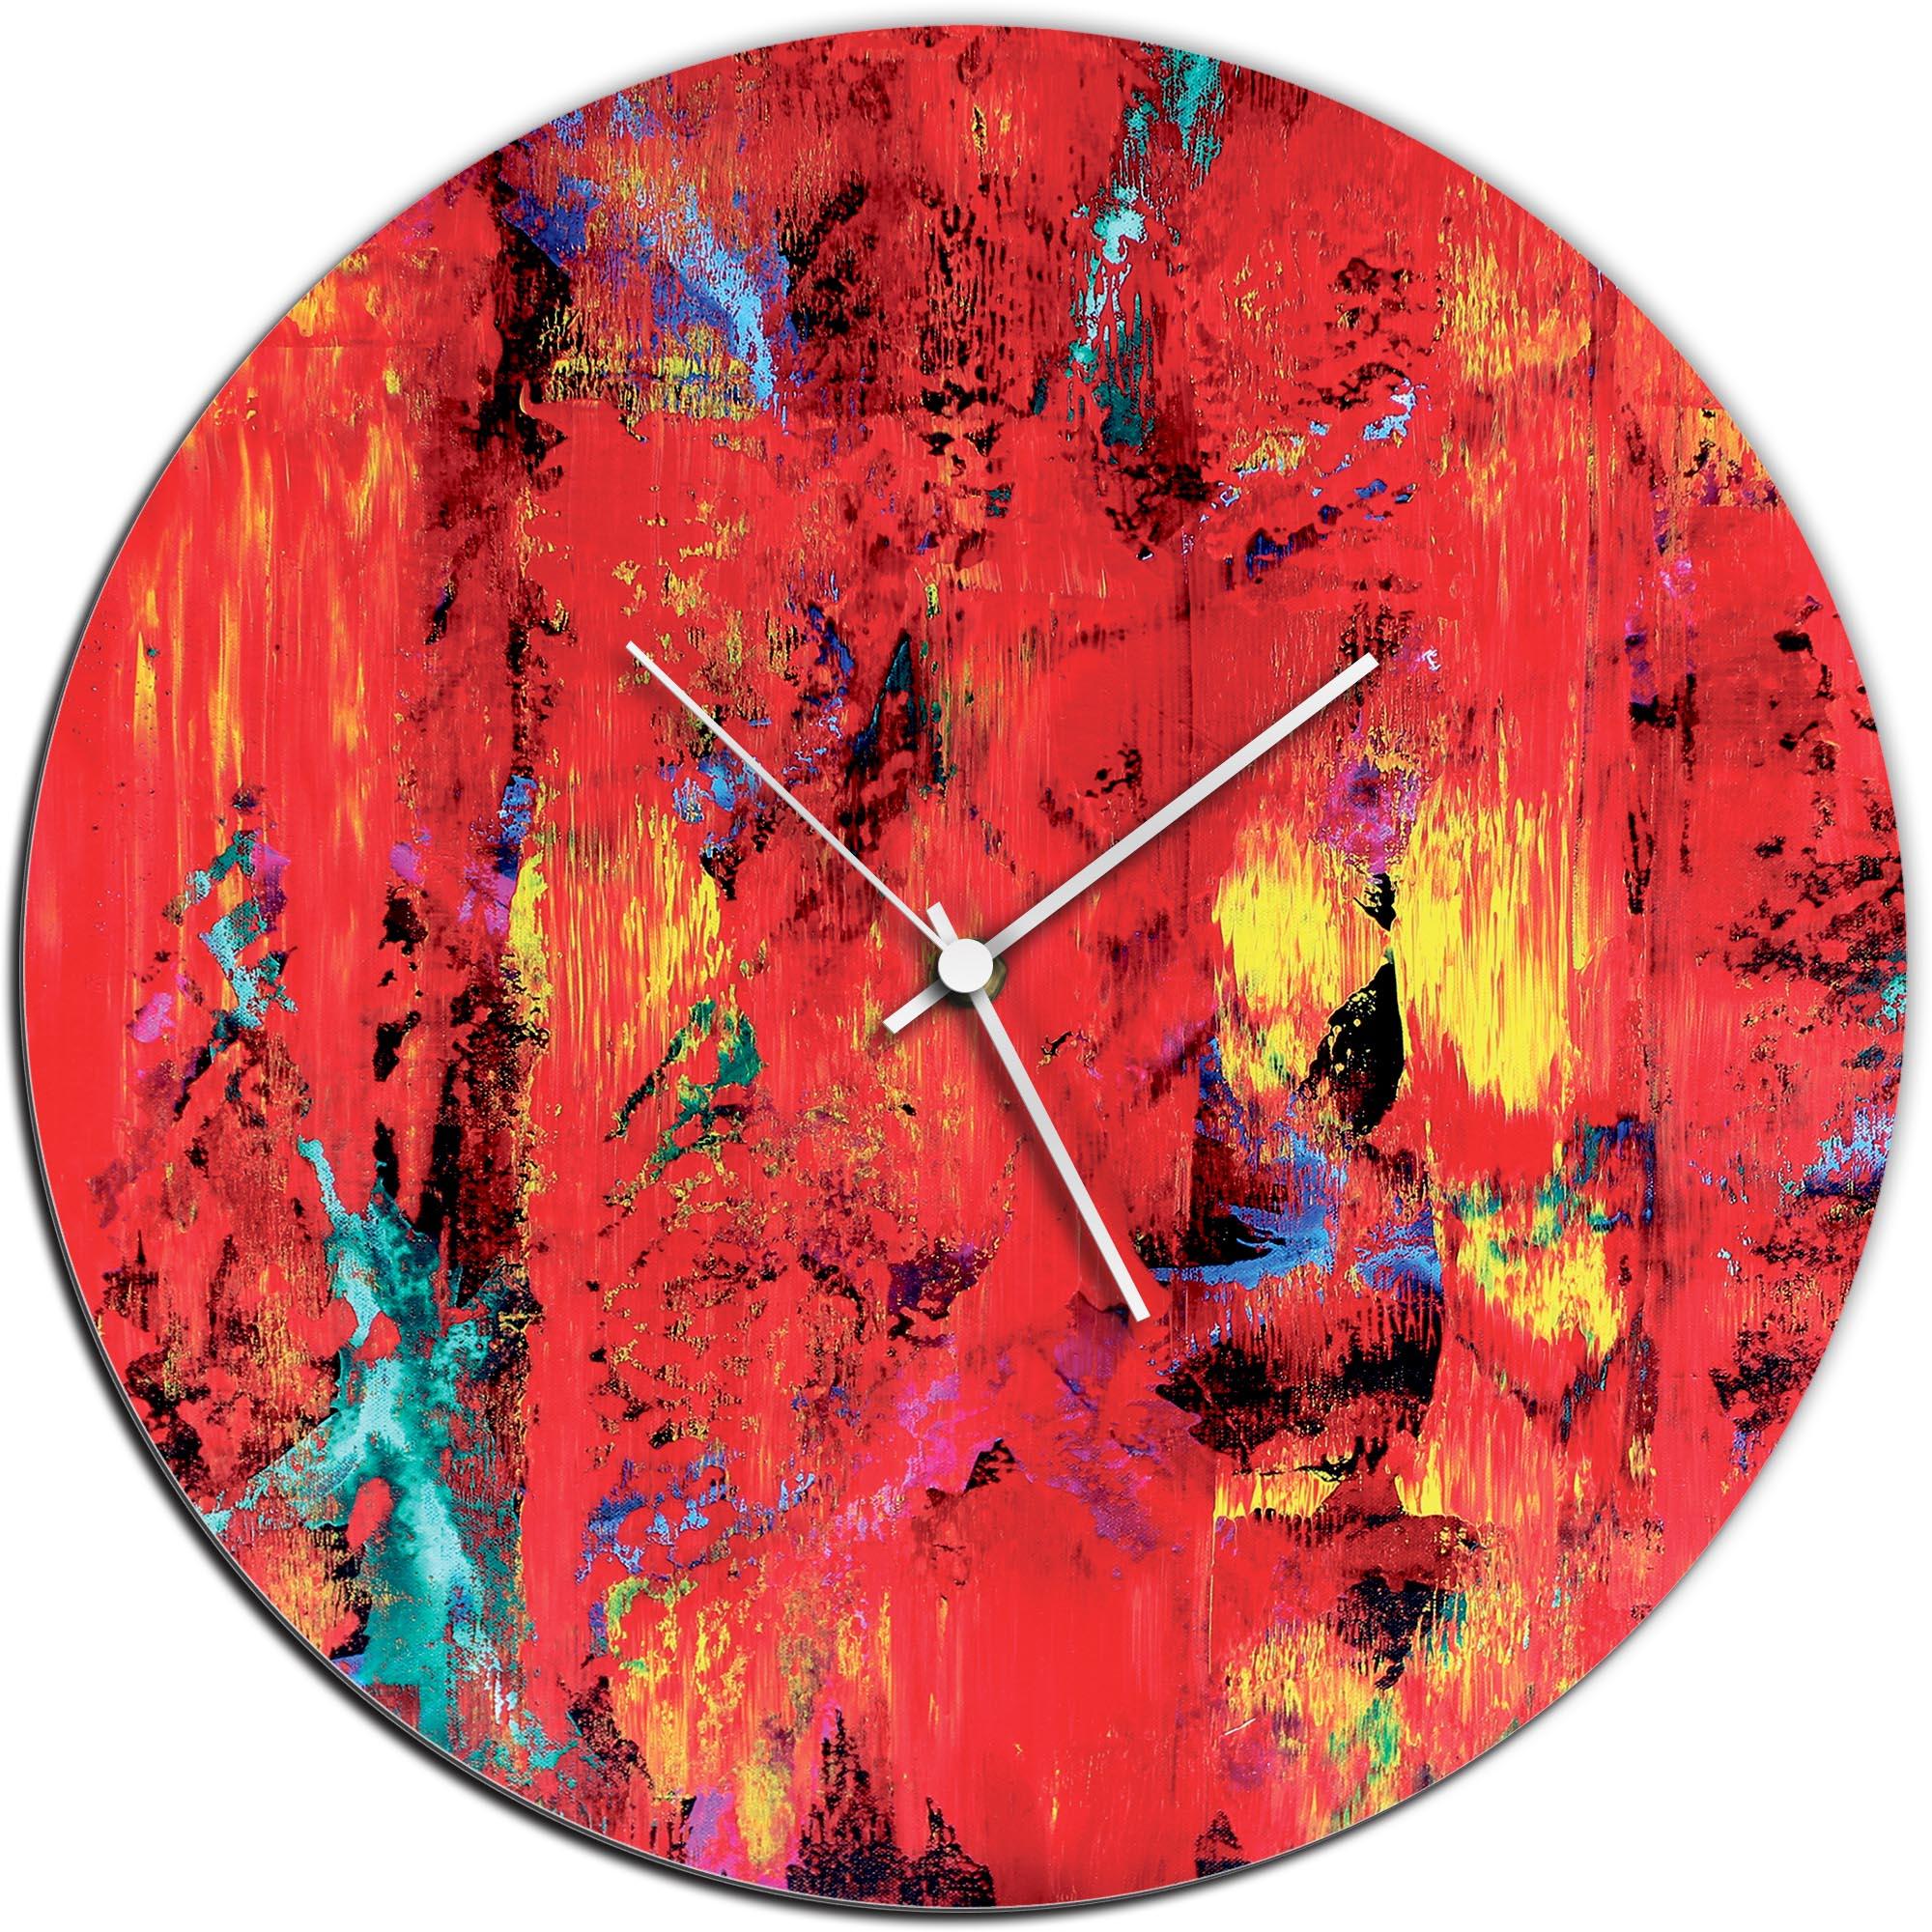 Mendo Vasilevski 'City Colors Circle Clock Large' 22in x 22in Modern Wall Clock on Aluminum Composite